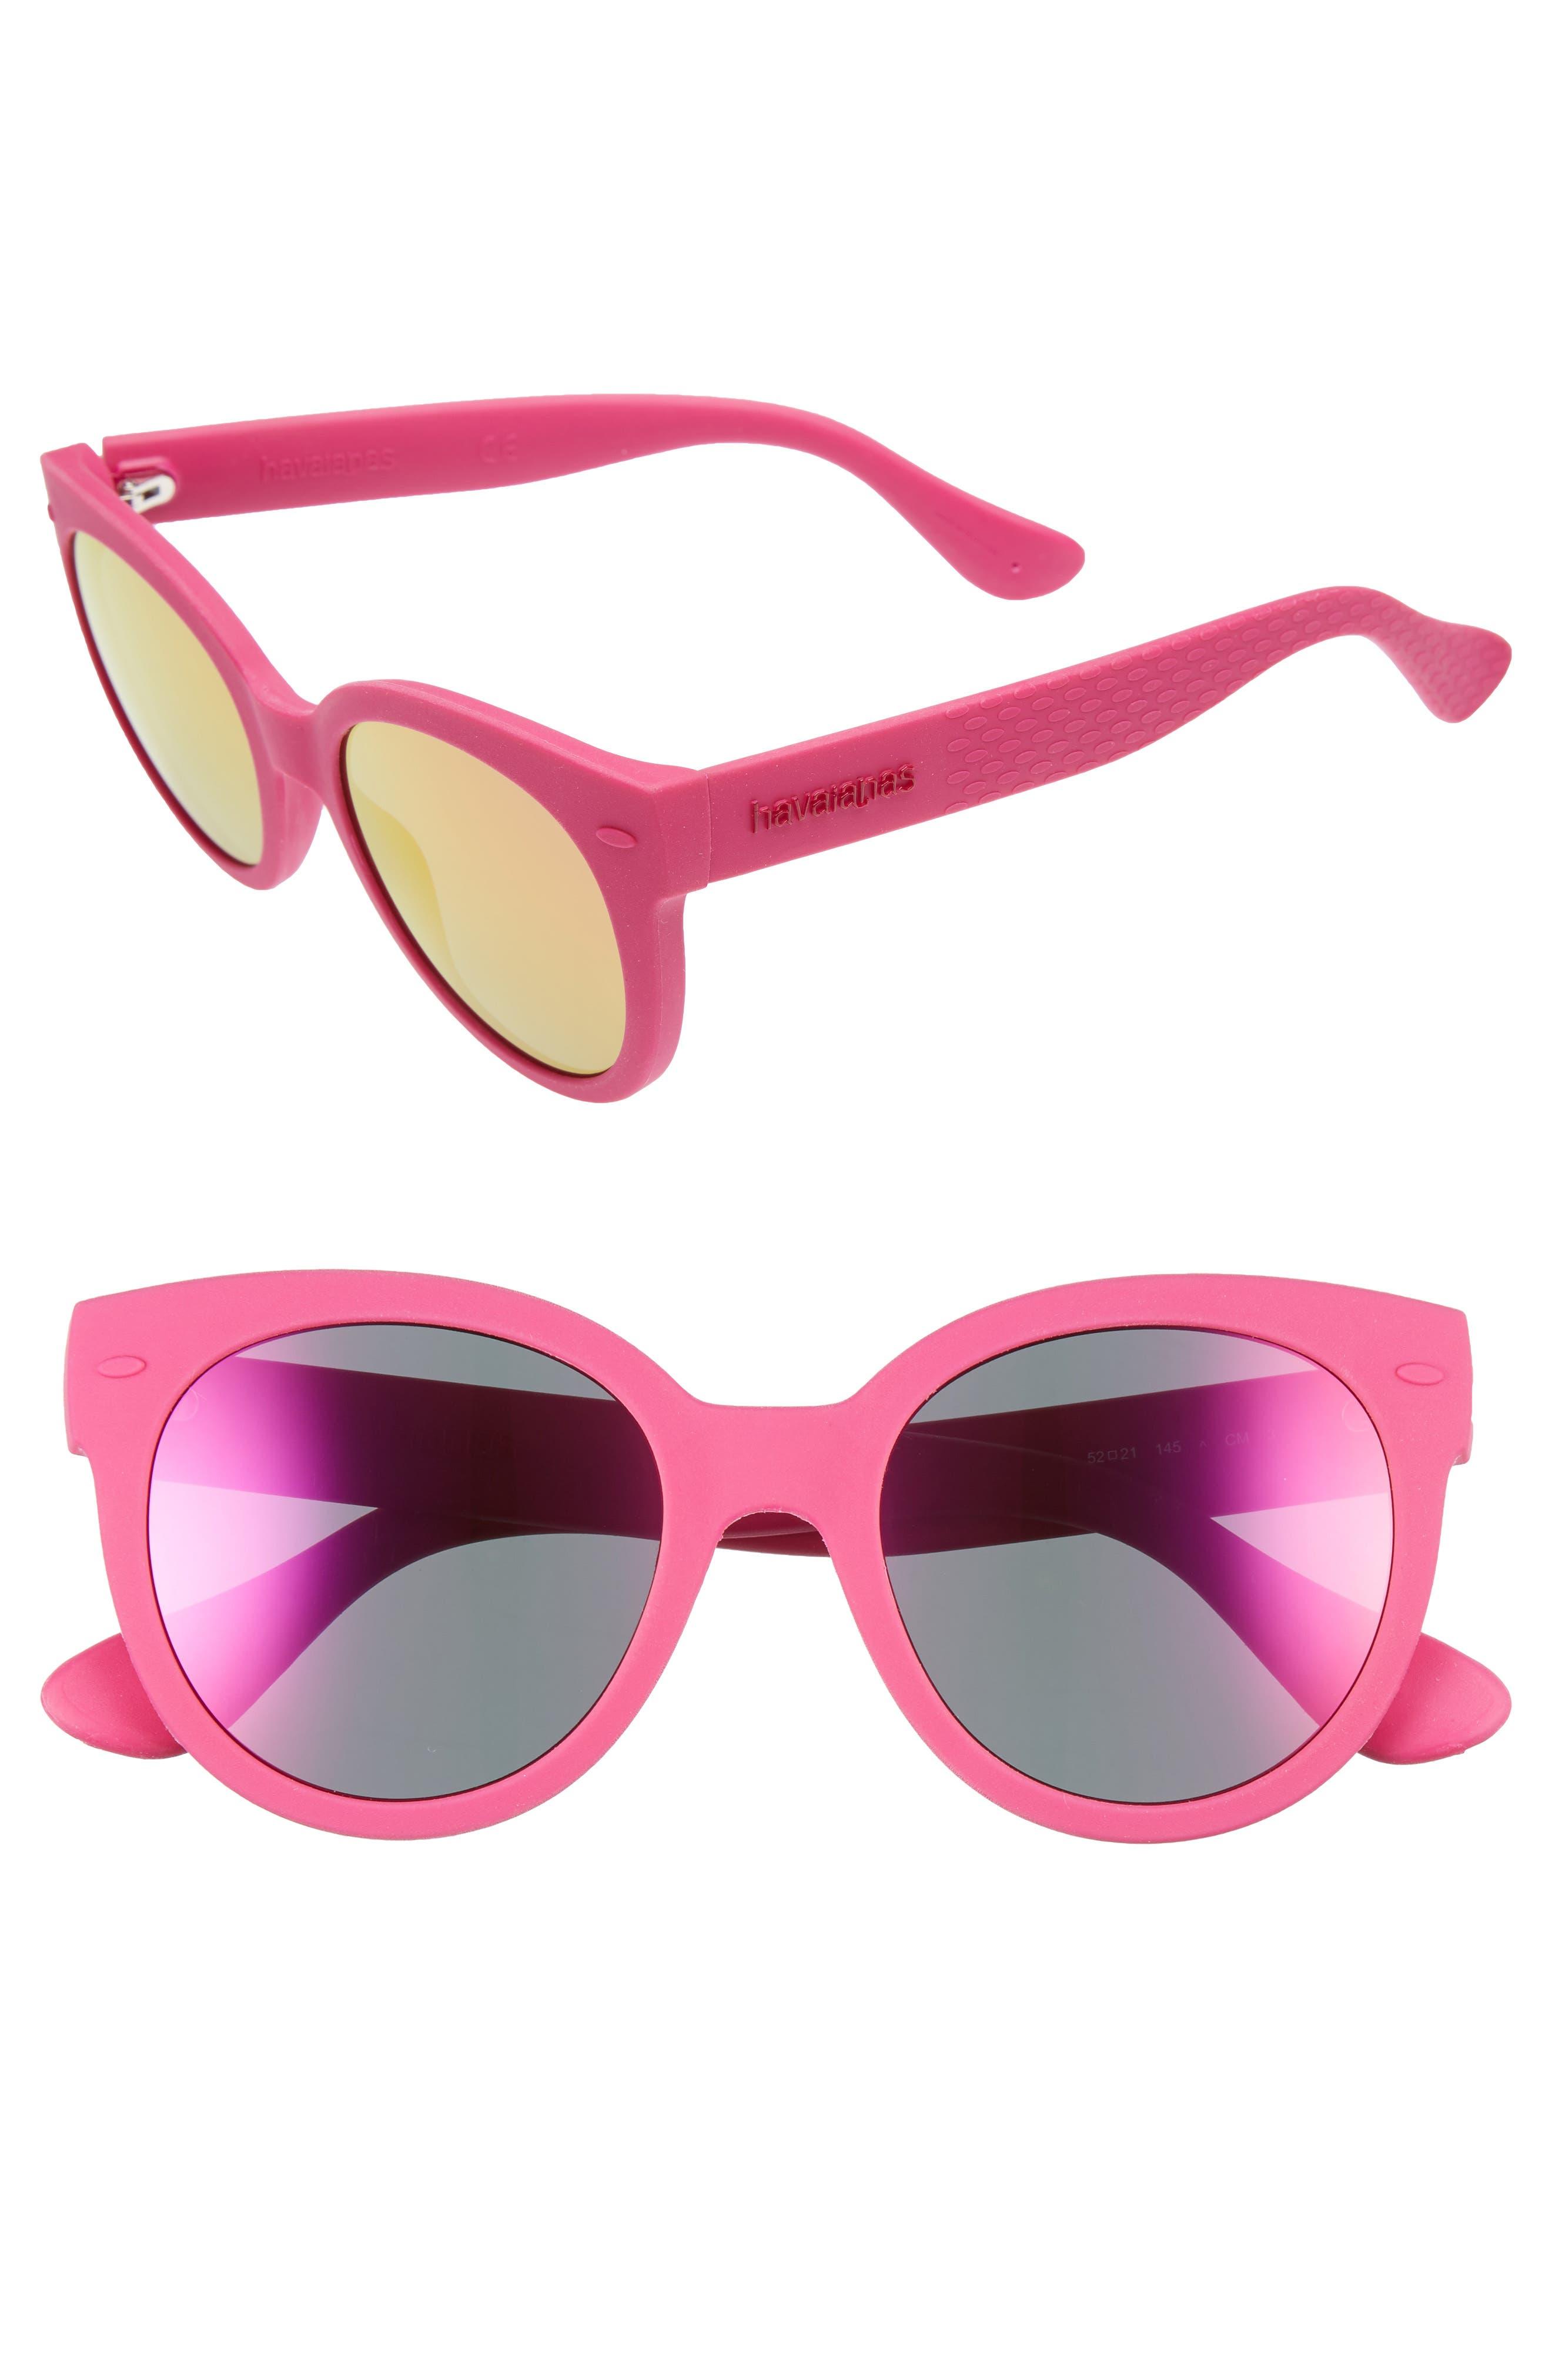 Havaianas 52mm Cat-Eye Sunglasses